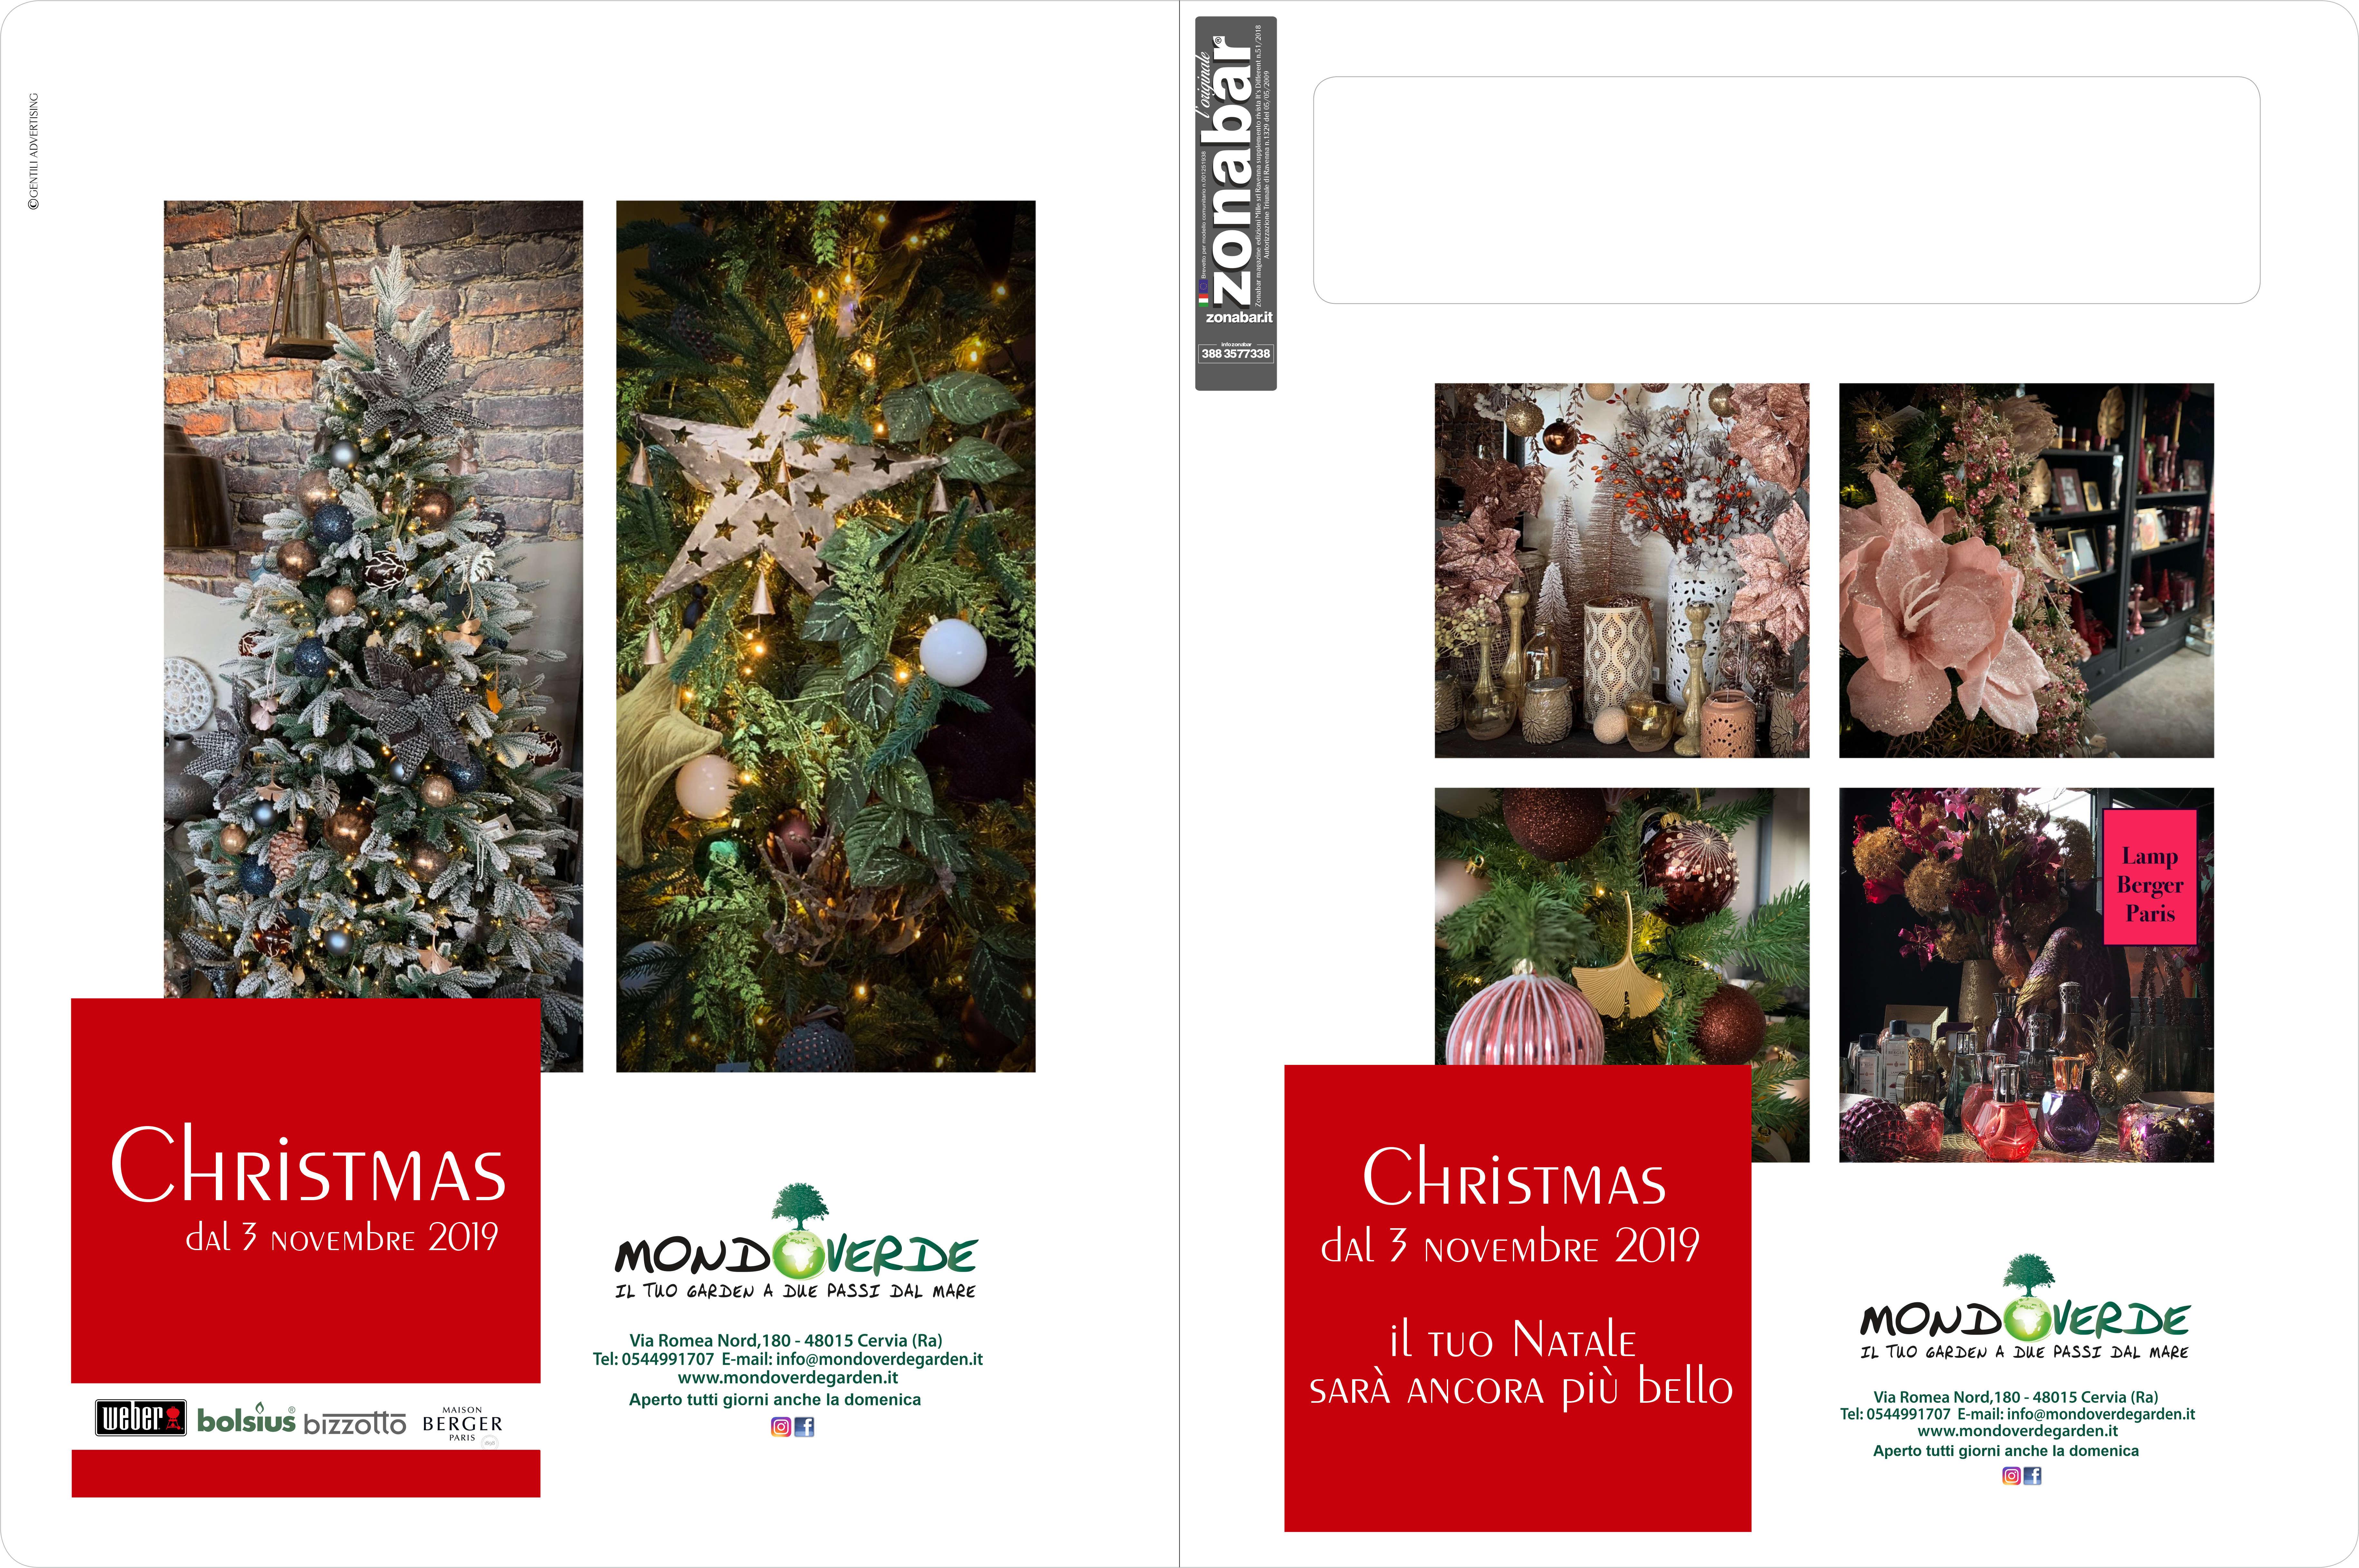 MONDO VERDE CHRISTMAS 2019